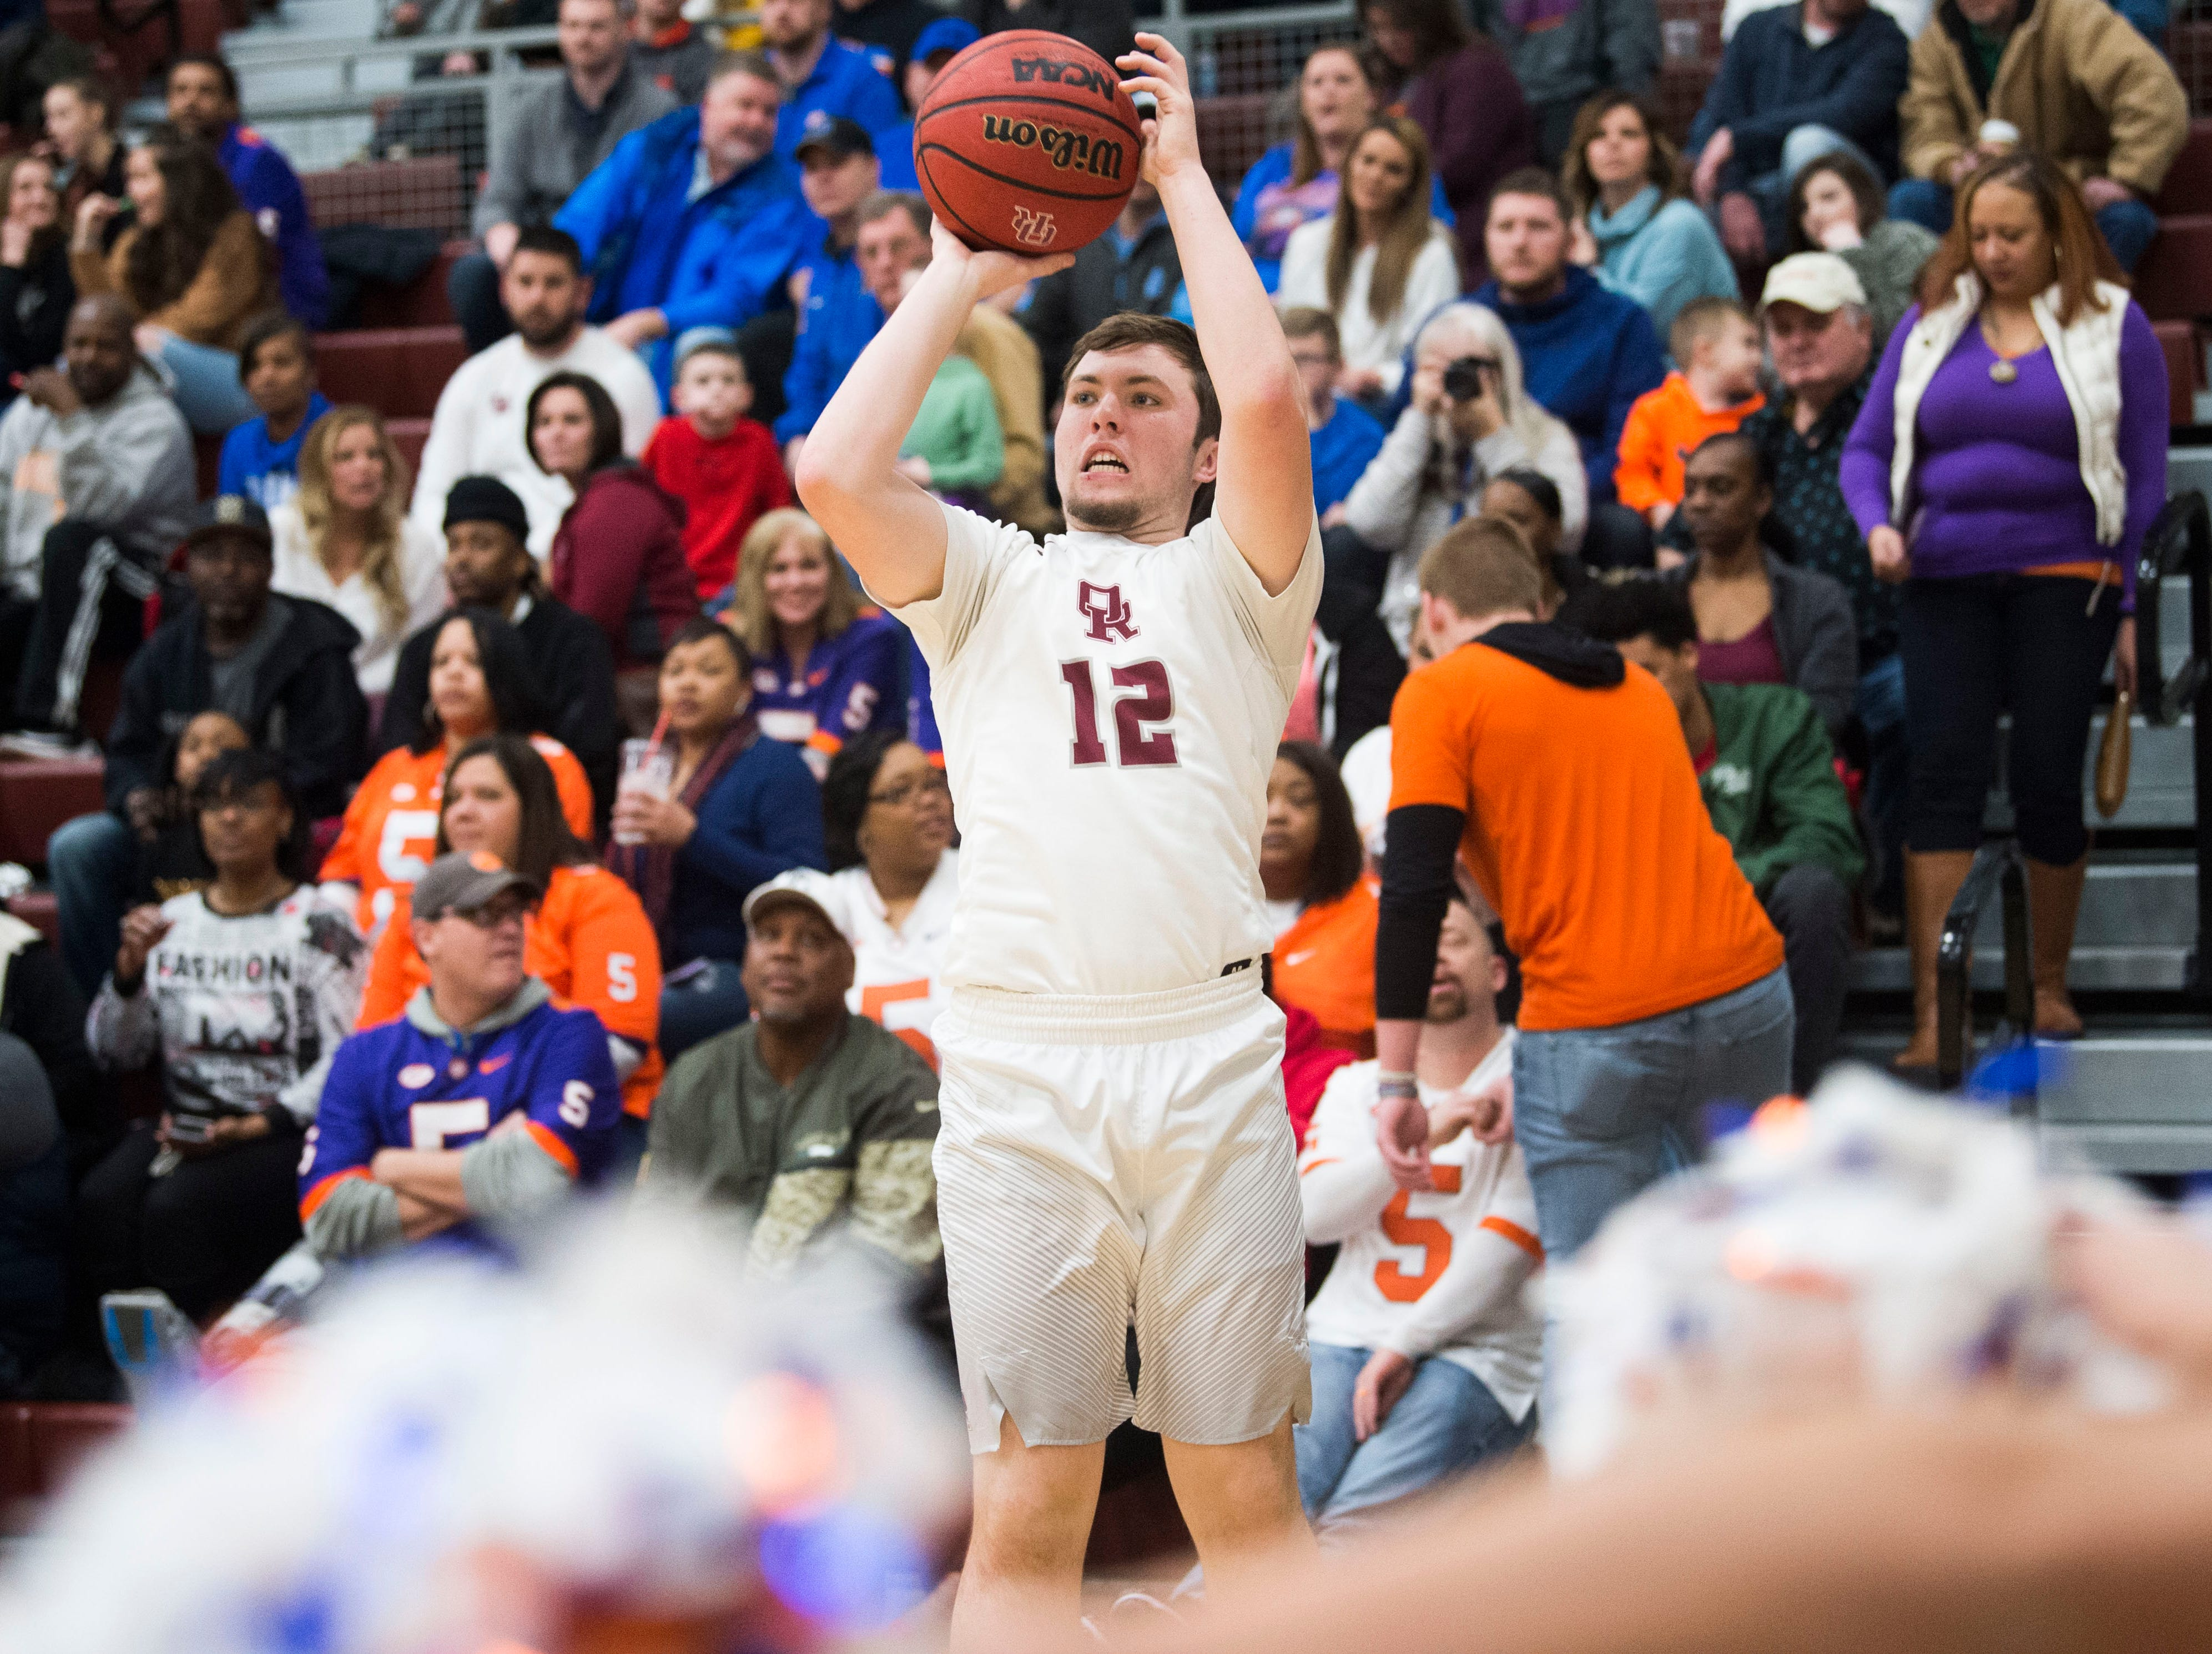 Oak Ridge's Joe Kesterson (12) takes a shot during a high school basketball game between Oak Ridge and Campbell County at Oak Ridge Friday, Feb. 1, 2019.